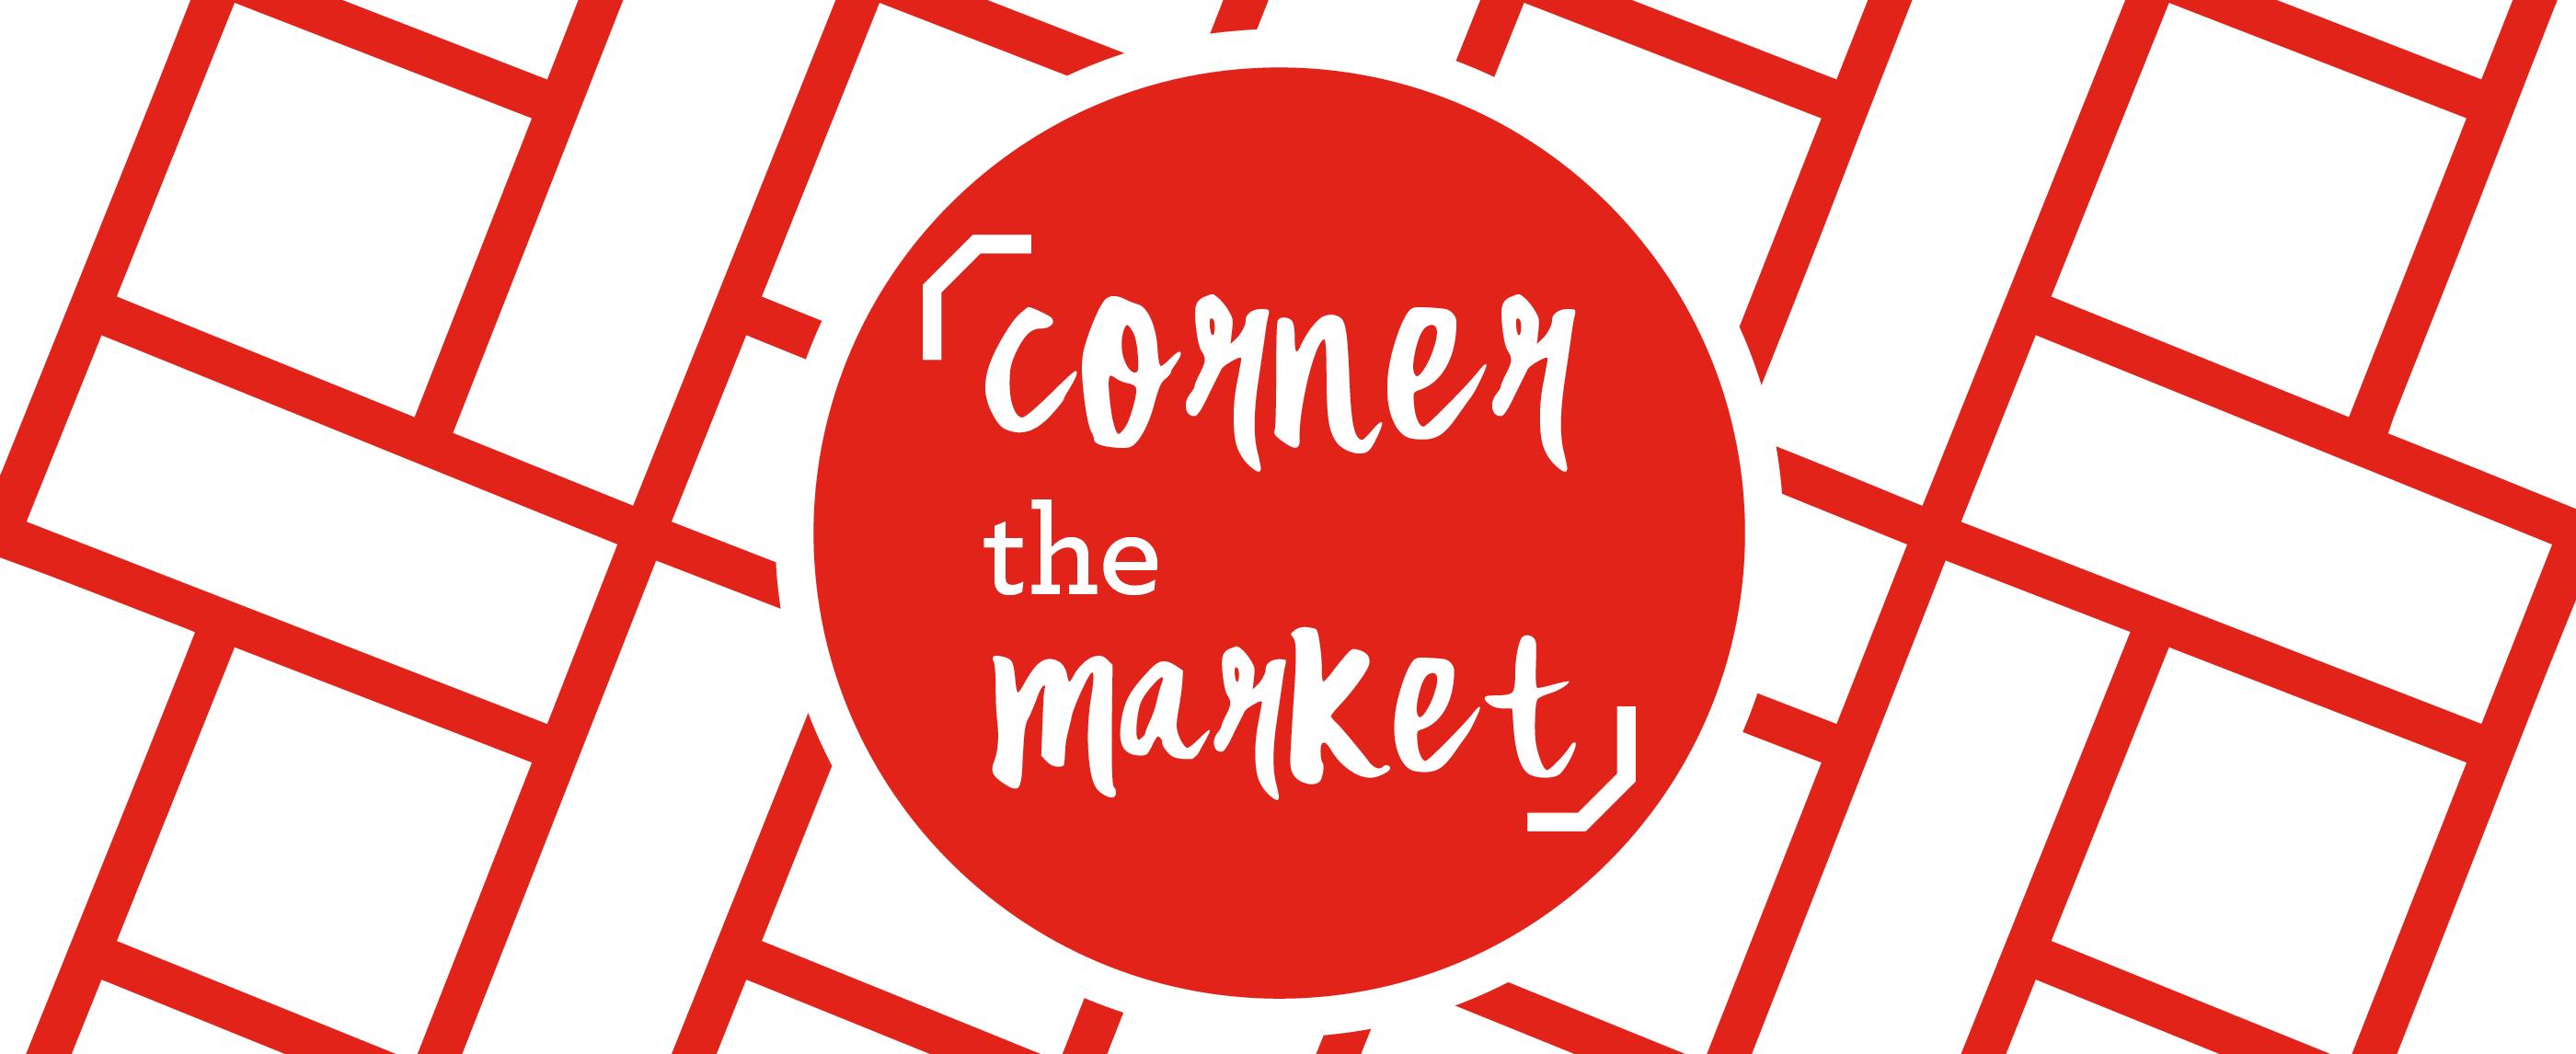 marketing-blog-featured